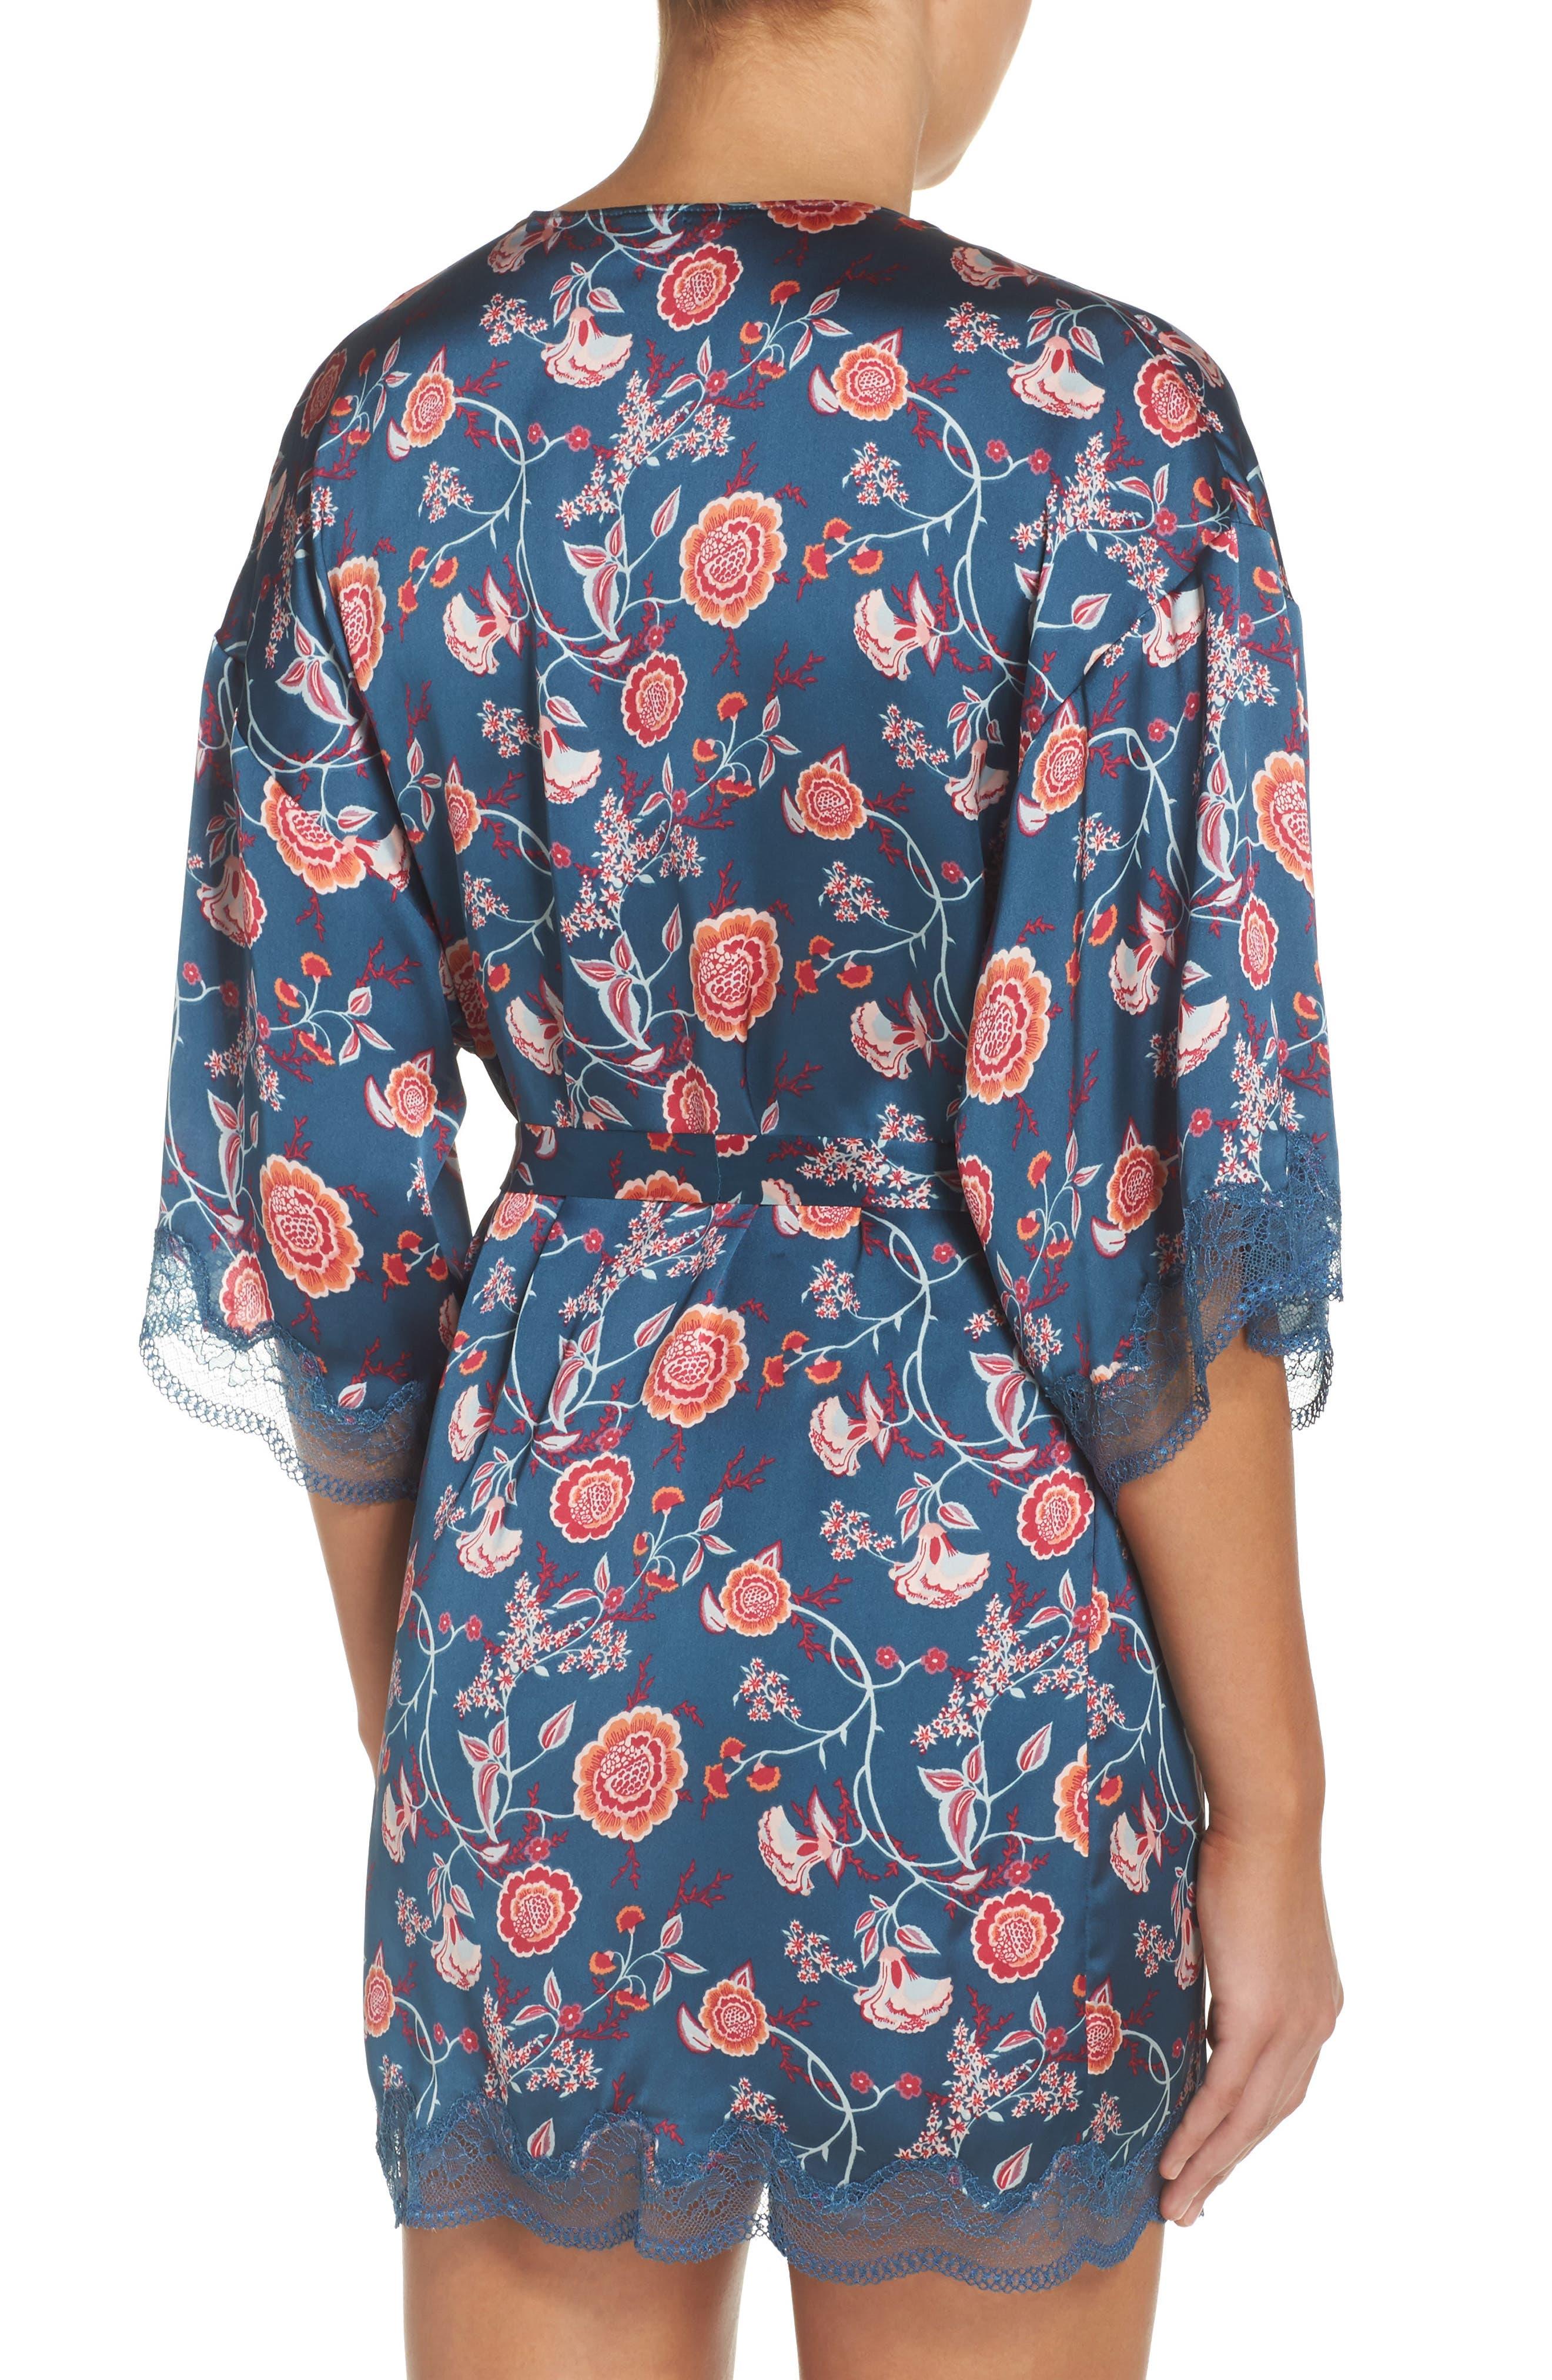 Floral Print Satin Kimono,                             Alternate thumbnail 2, color,                             Blue Ceramic Vintage Floral